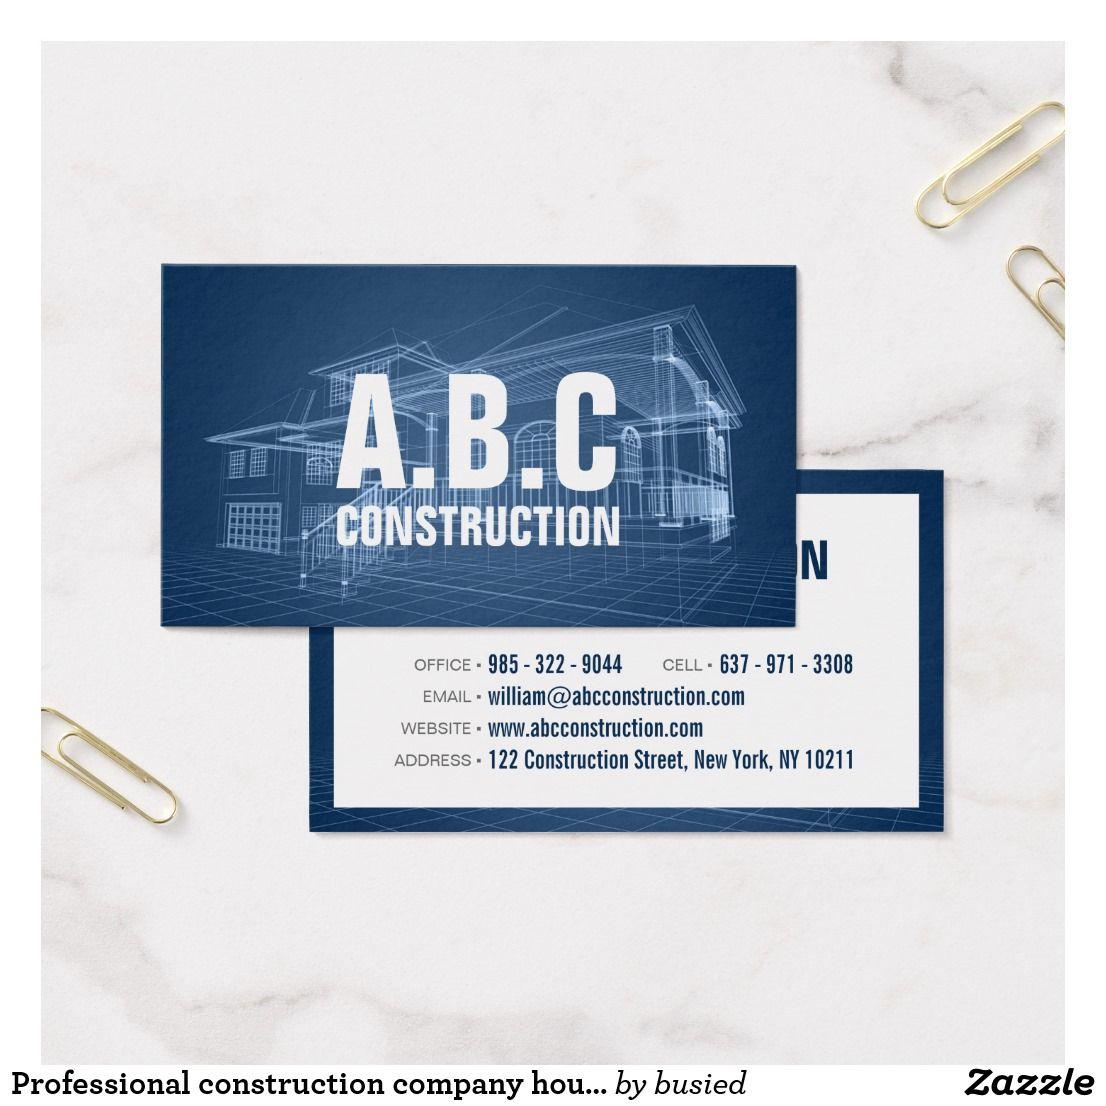 Professional construction company house blueprint business card professional construction company house blueprint business card malvernweather Gallery